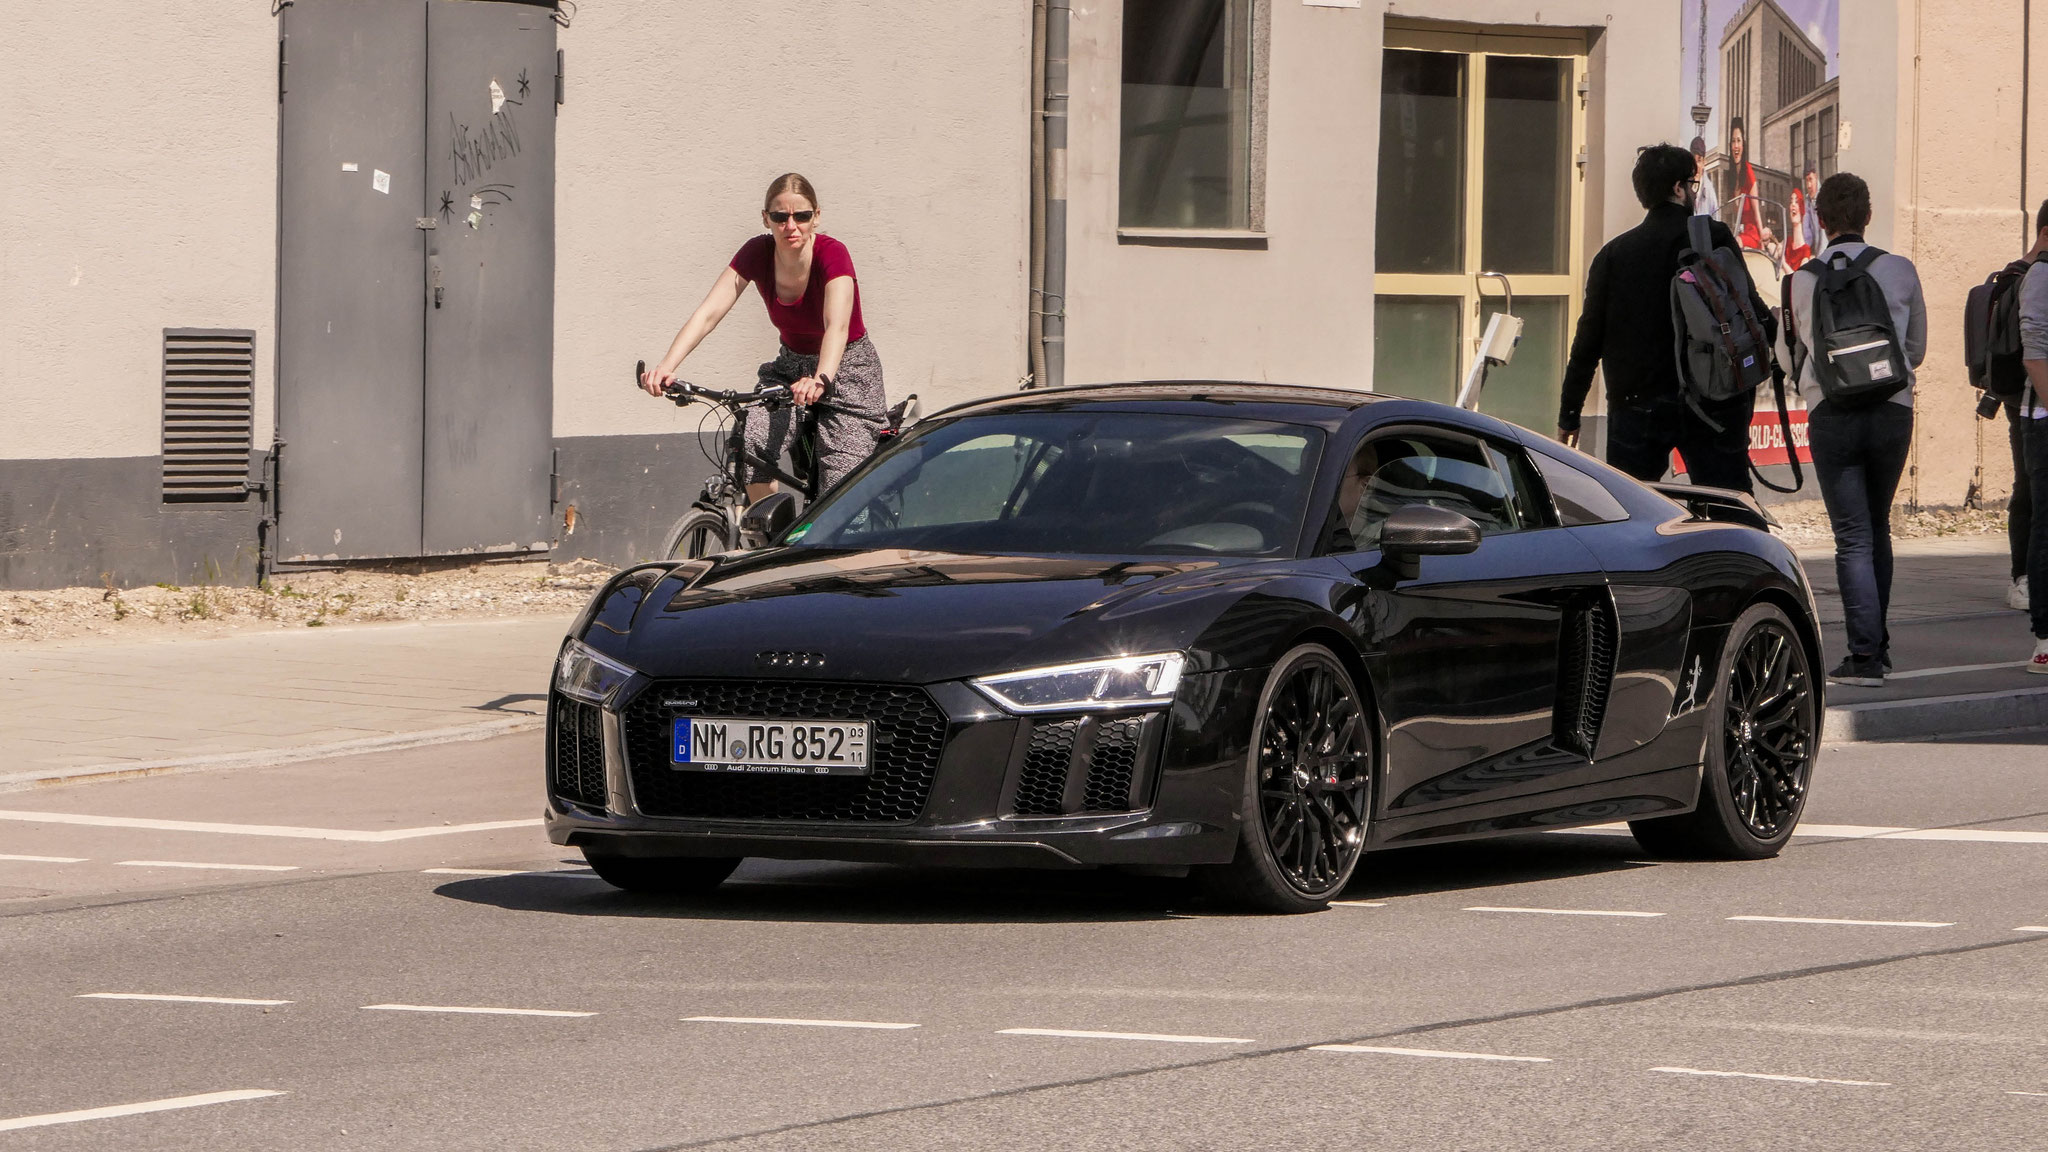 Audi R8 V10 - NM-RG-852